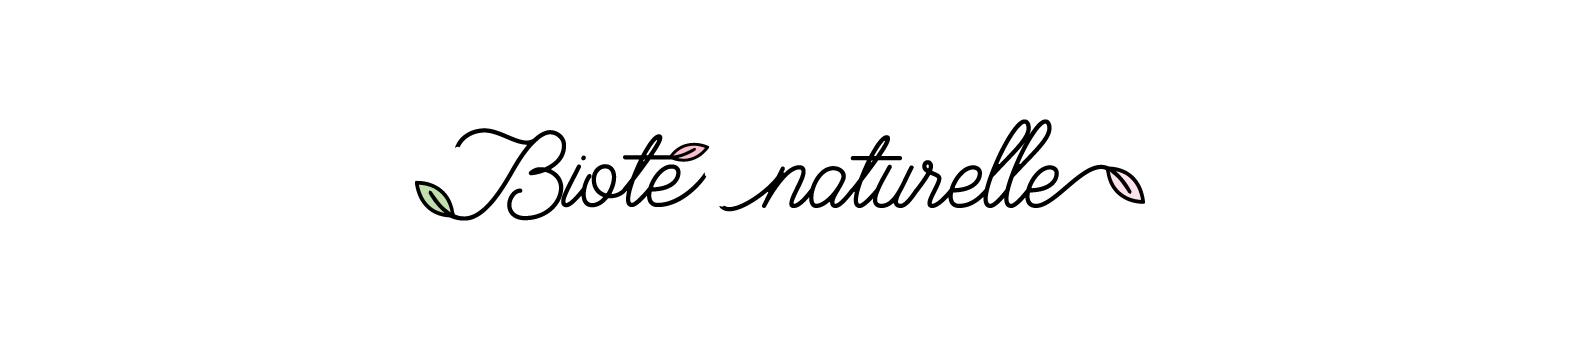 Bioté Naturelle